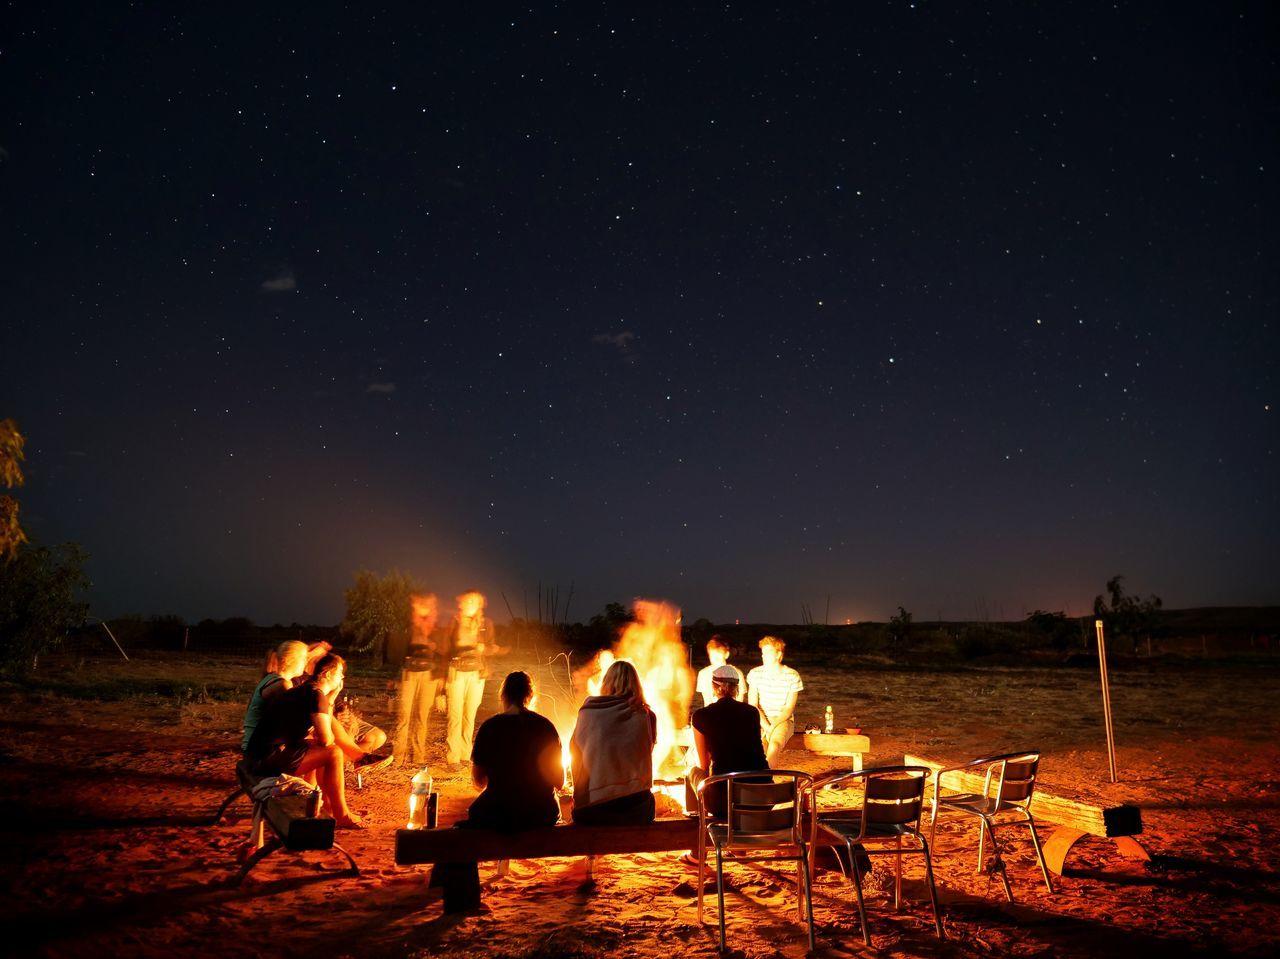 night, burning, fire, heat - temperature, fire - natural phenomenon